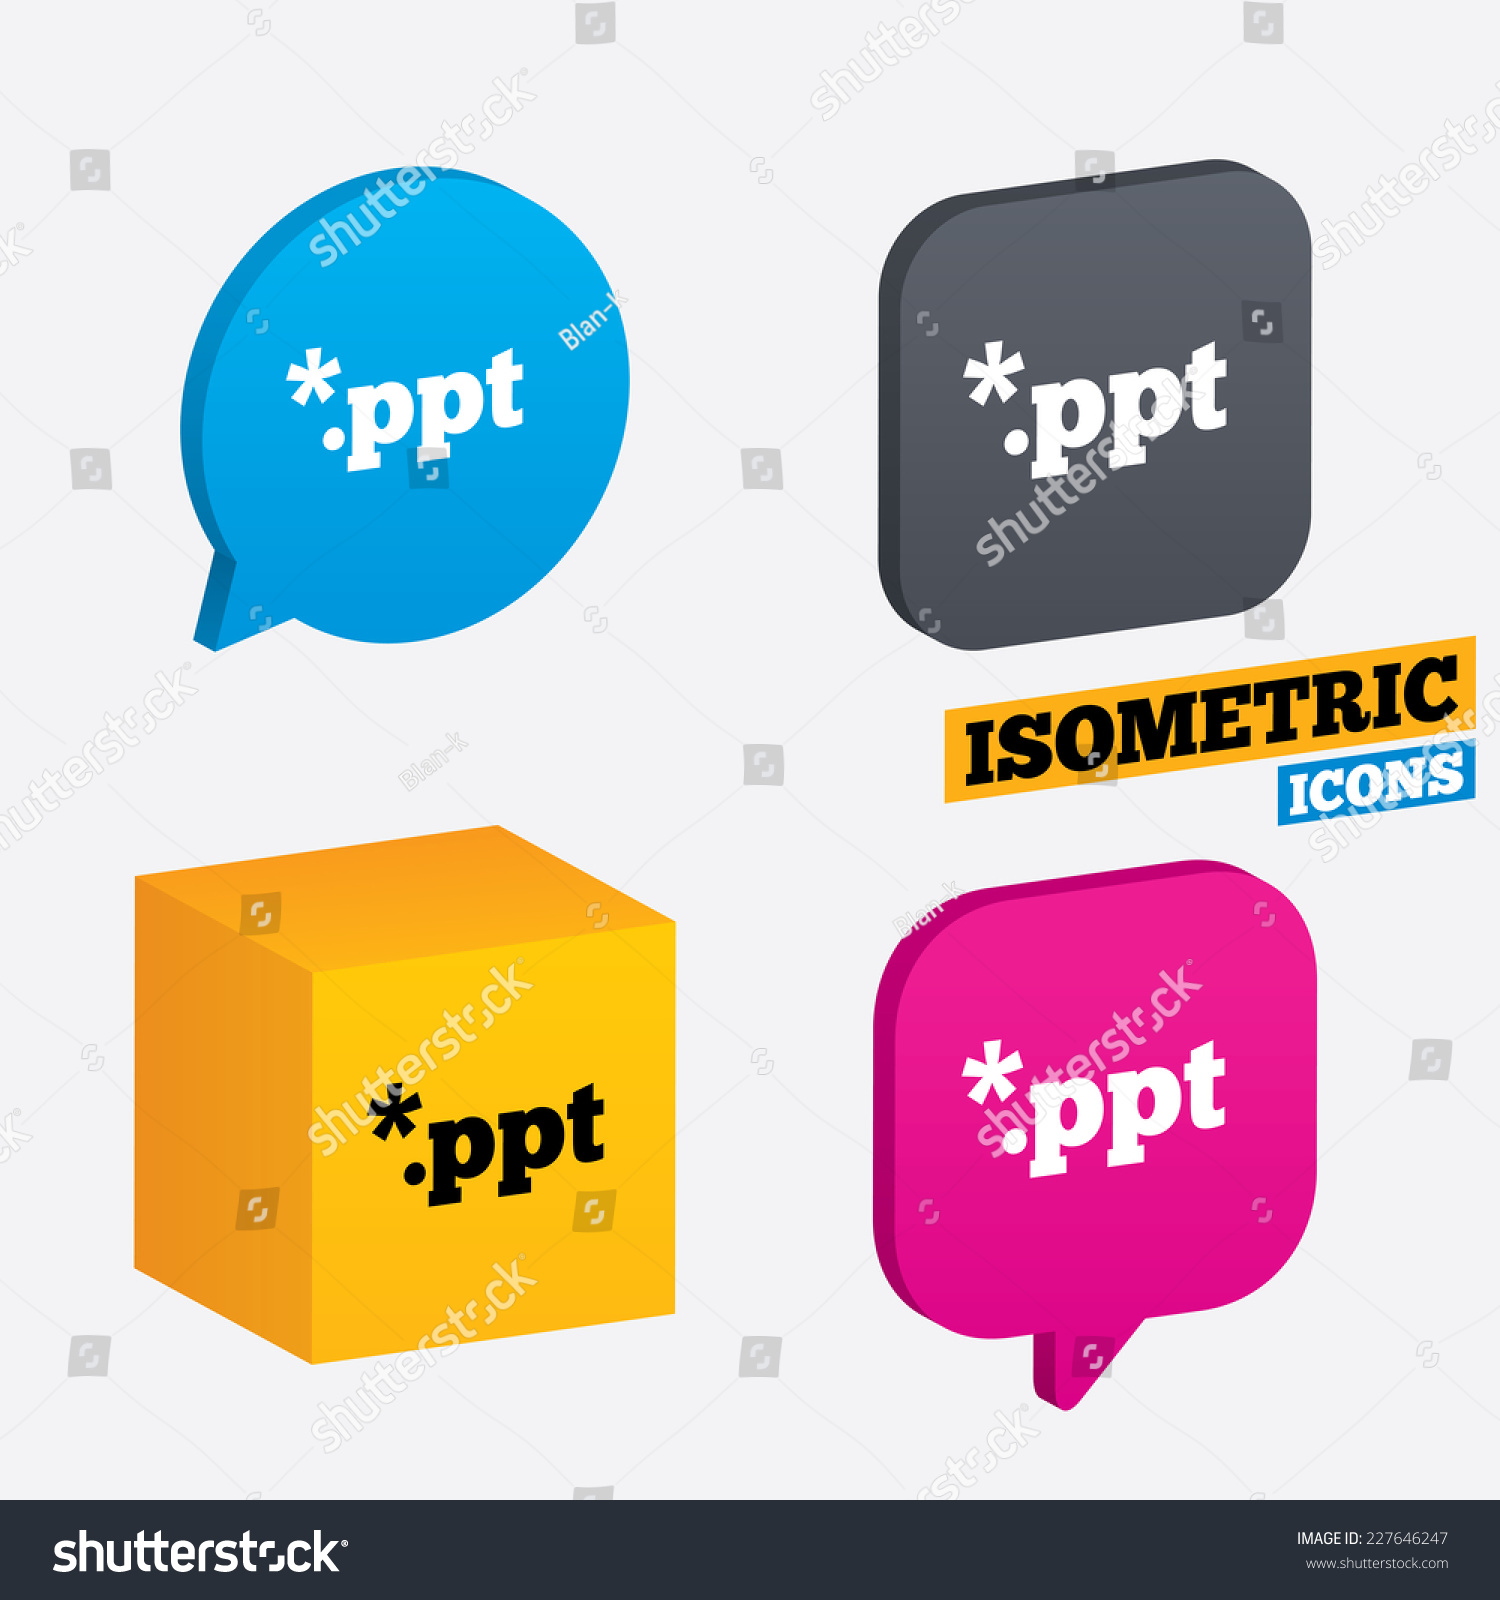 Argumentative essay powerpoint extension